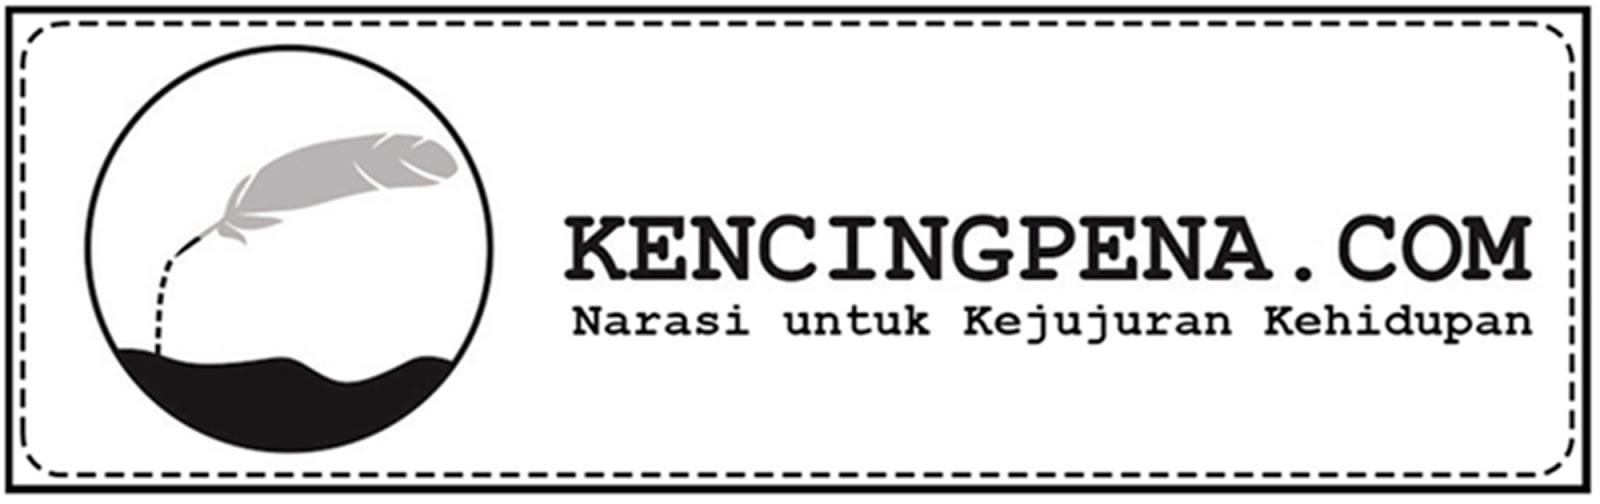 http://www.kencingpena.com/index.html